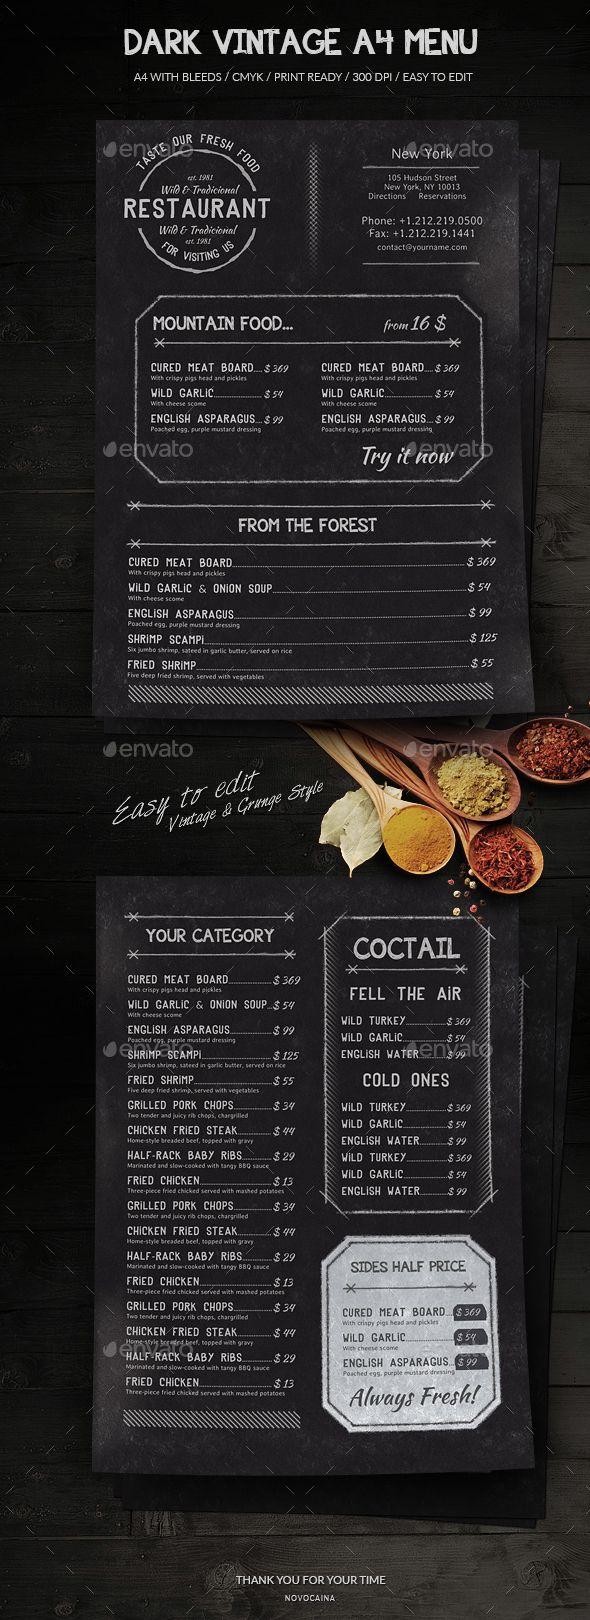 Dark Vintage A4 Menu - Food Menus Print Templates Download here : https://graphicriver.net/item/dark-vintage-a4-menu/18788207?s_rank=143&ref=Al-fatih